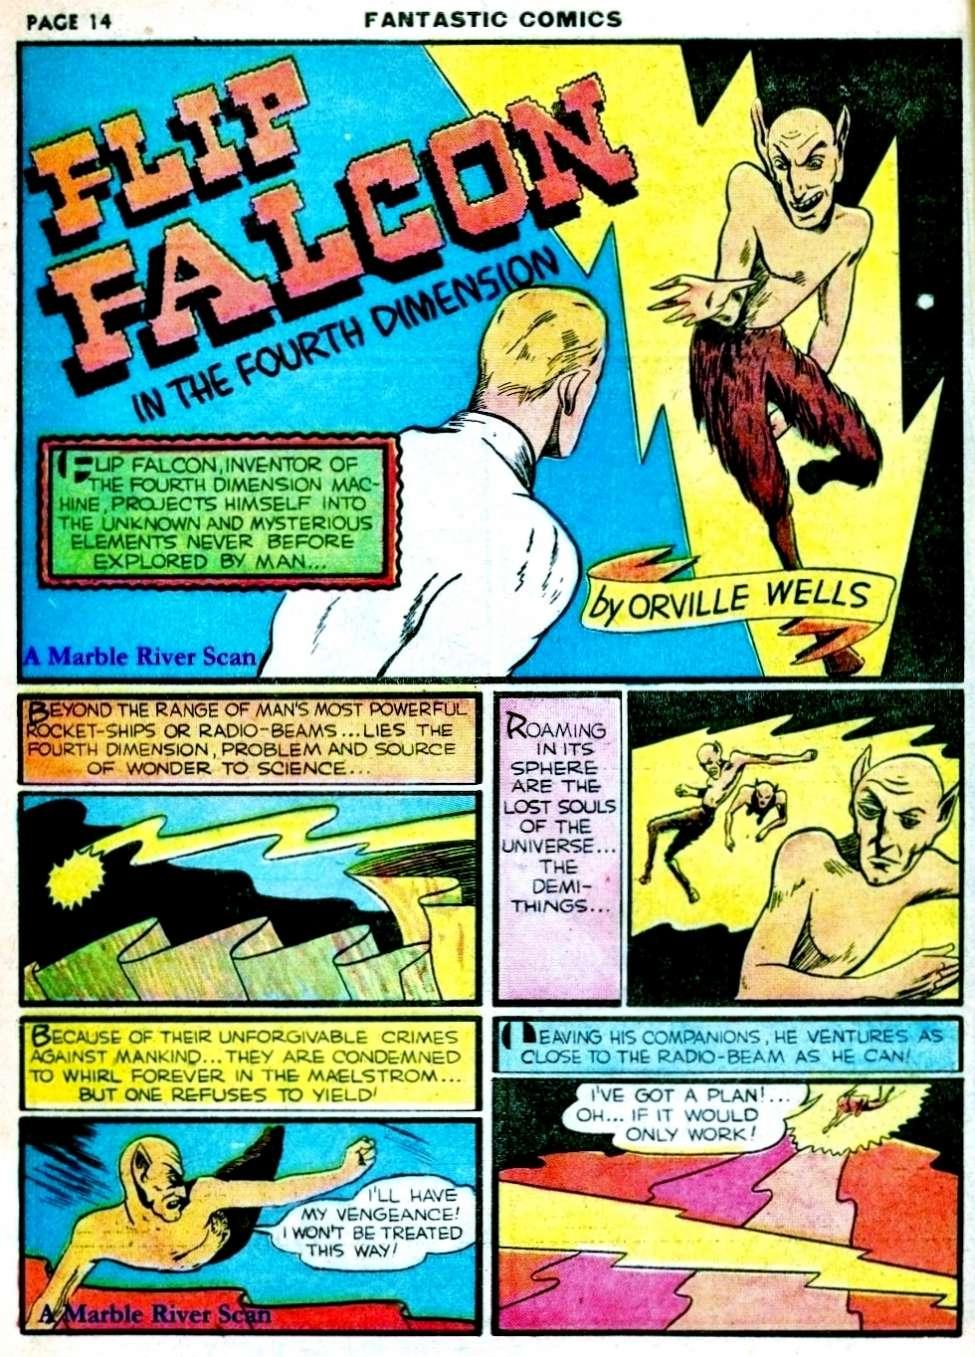 Comic Book Cover For Flip Falcon in the 4th Dimension Part 2